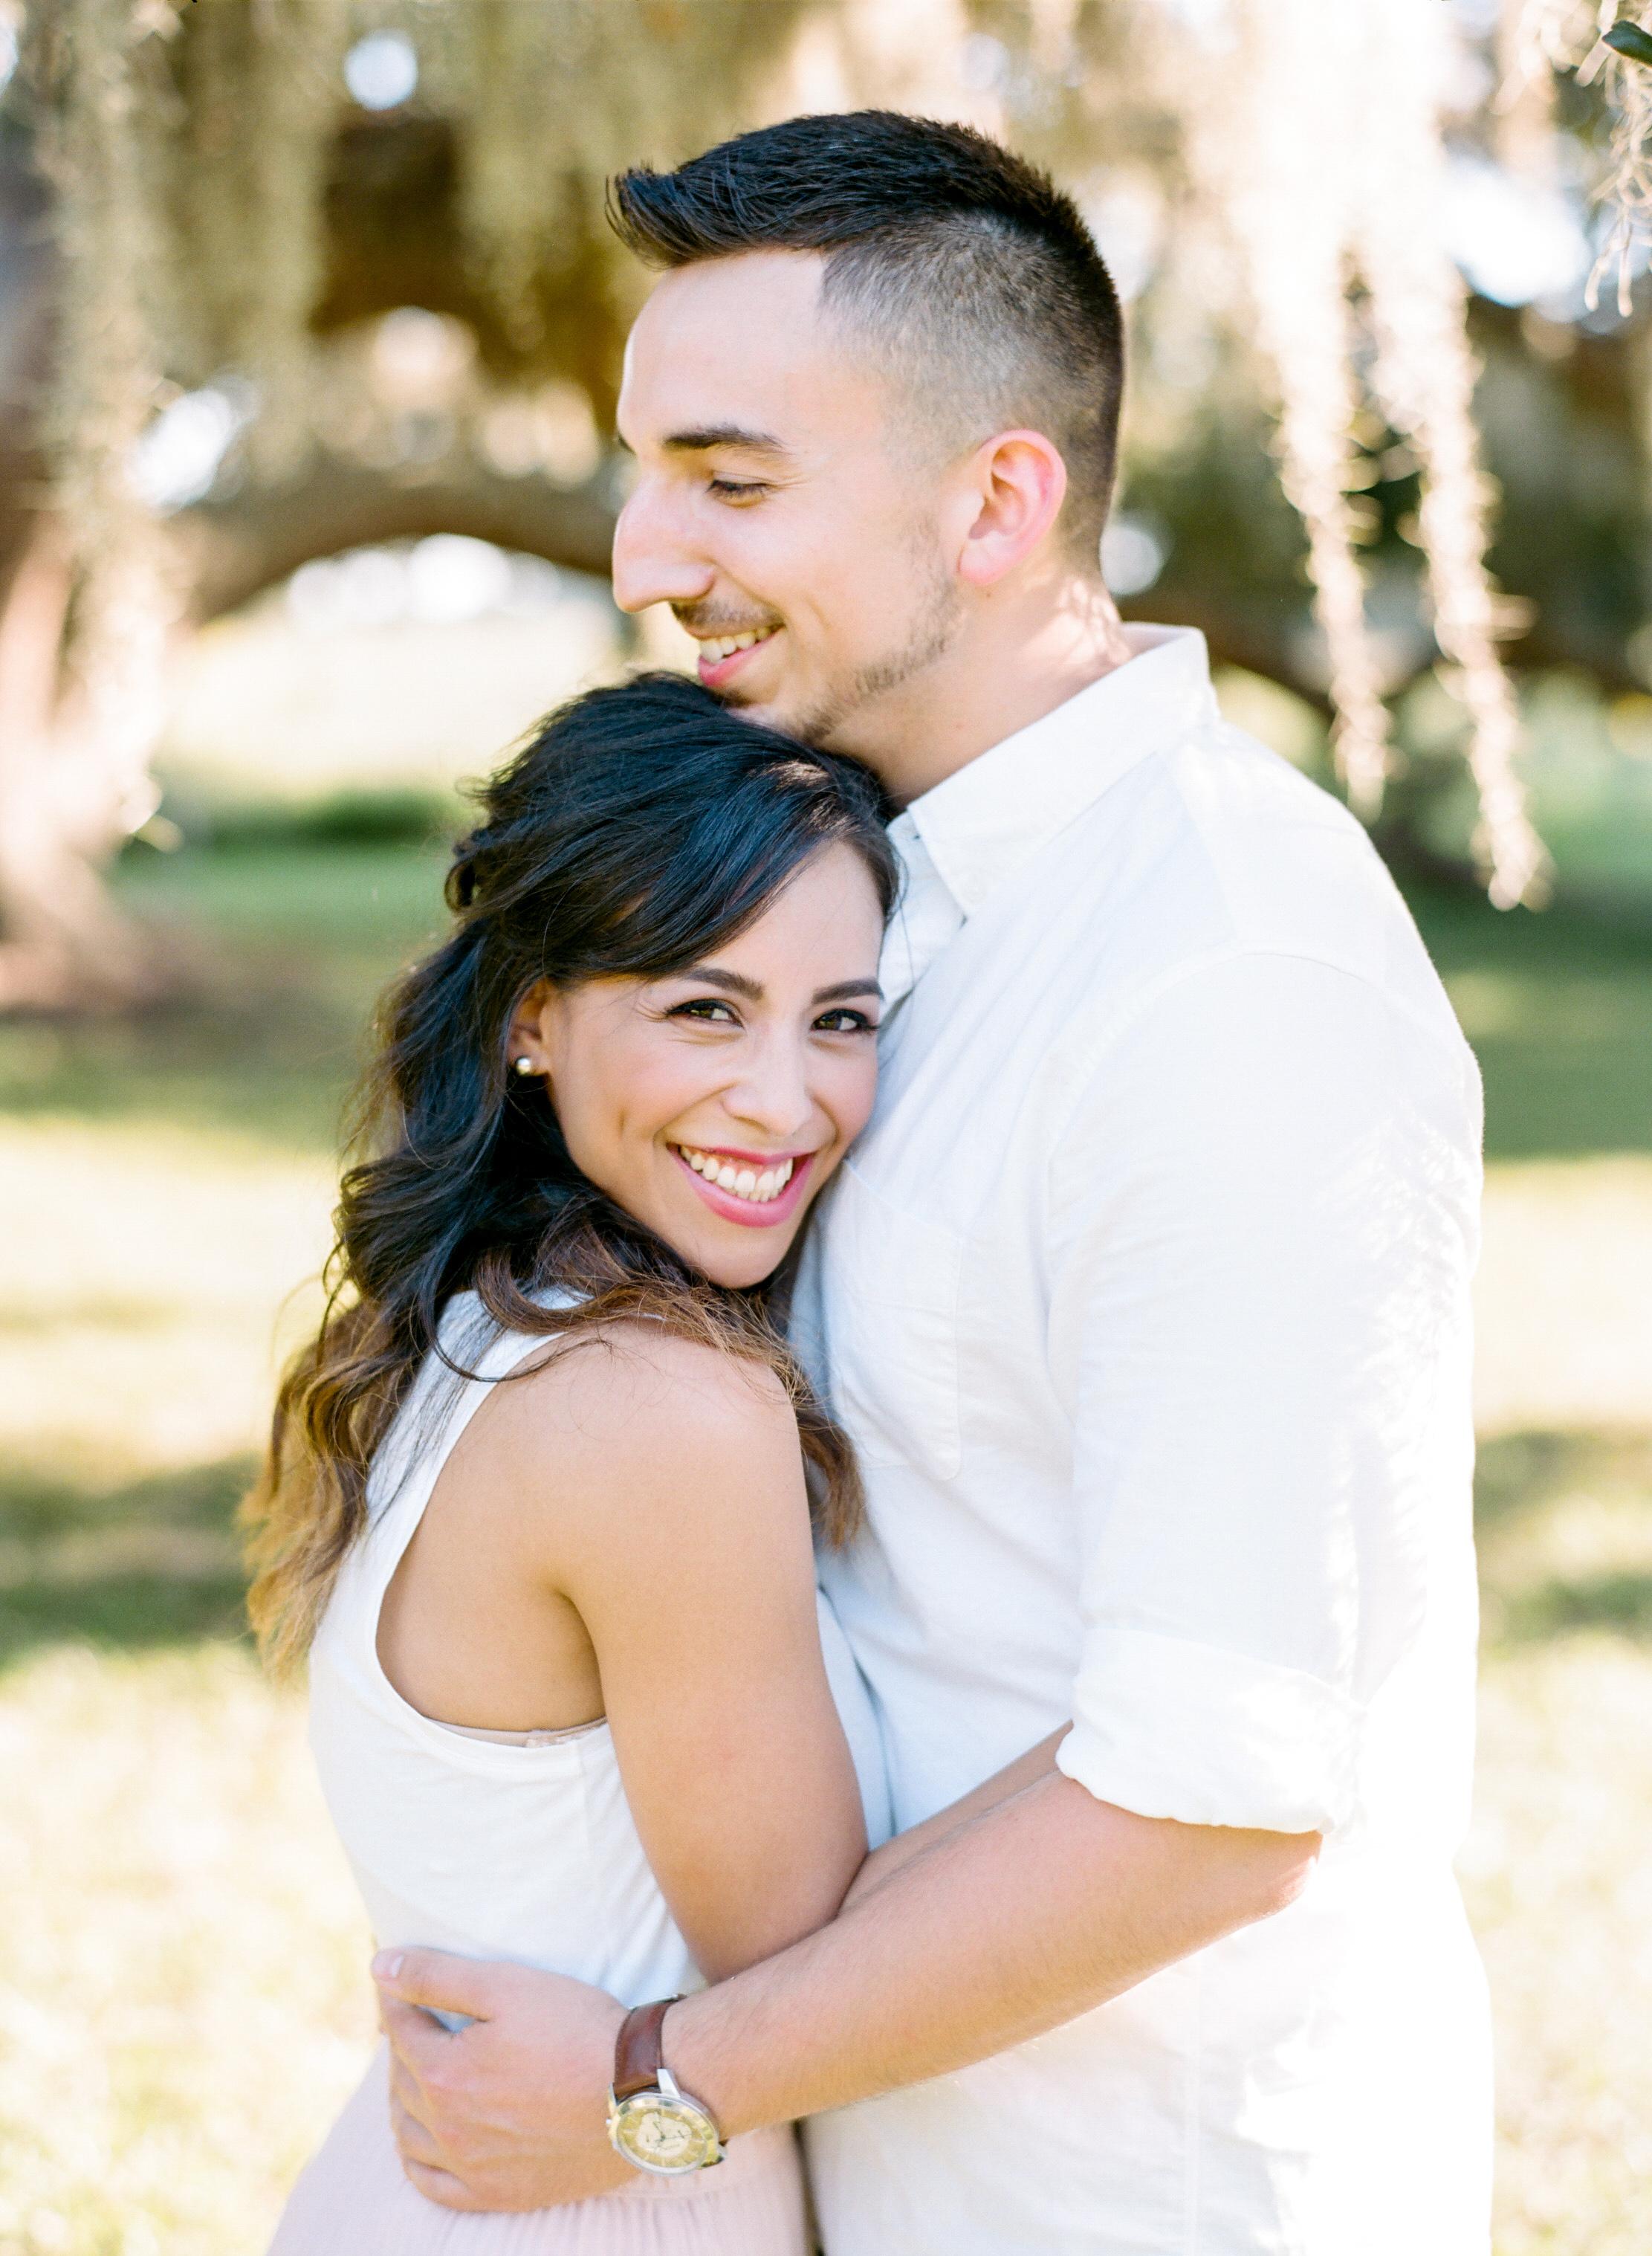 Dana-Fernandez-Photography-Houston-Wedding-Photographer-Film-Style-Me-Pretty-8.jpg